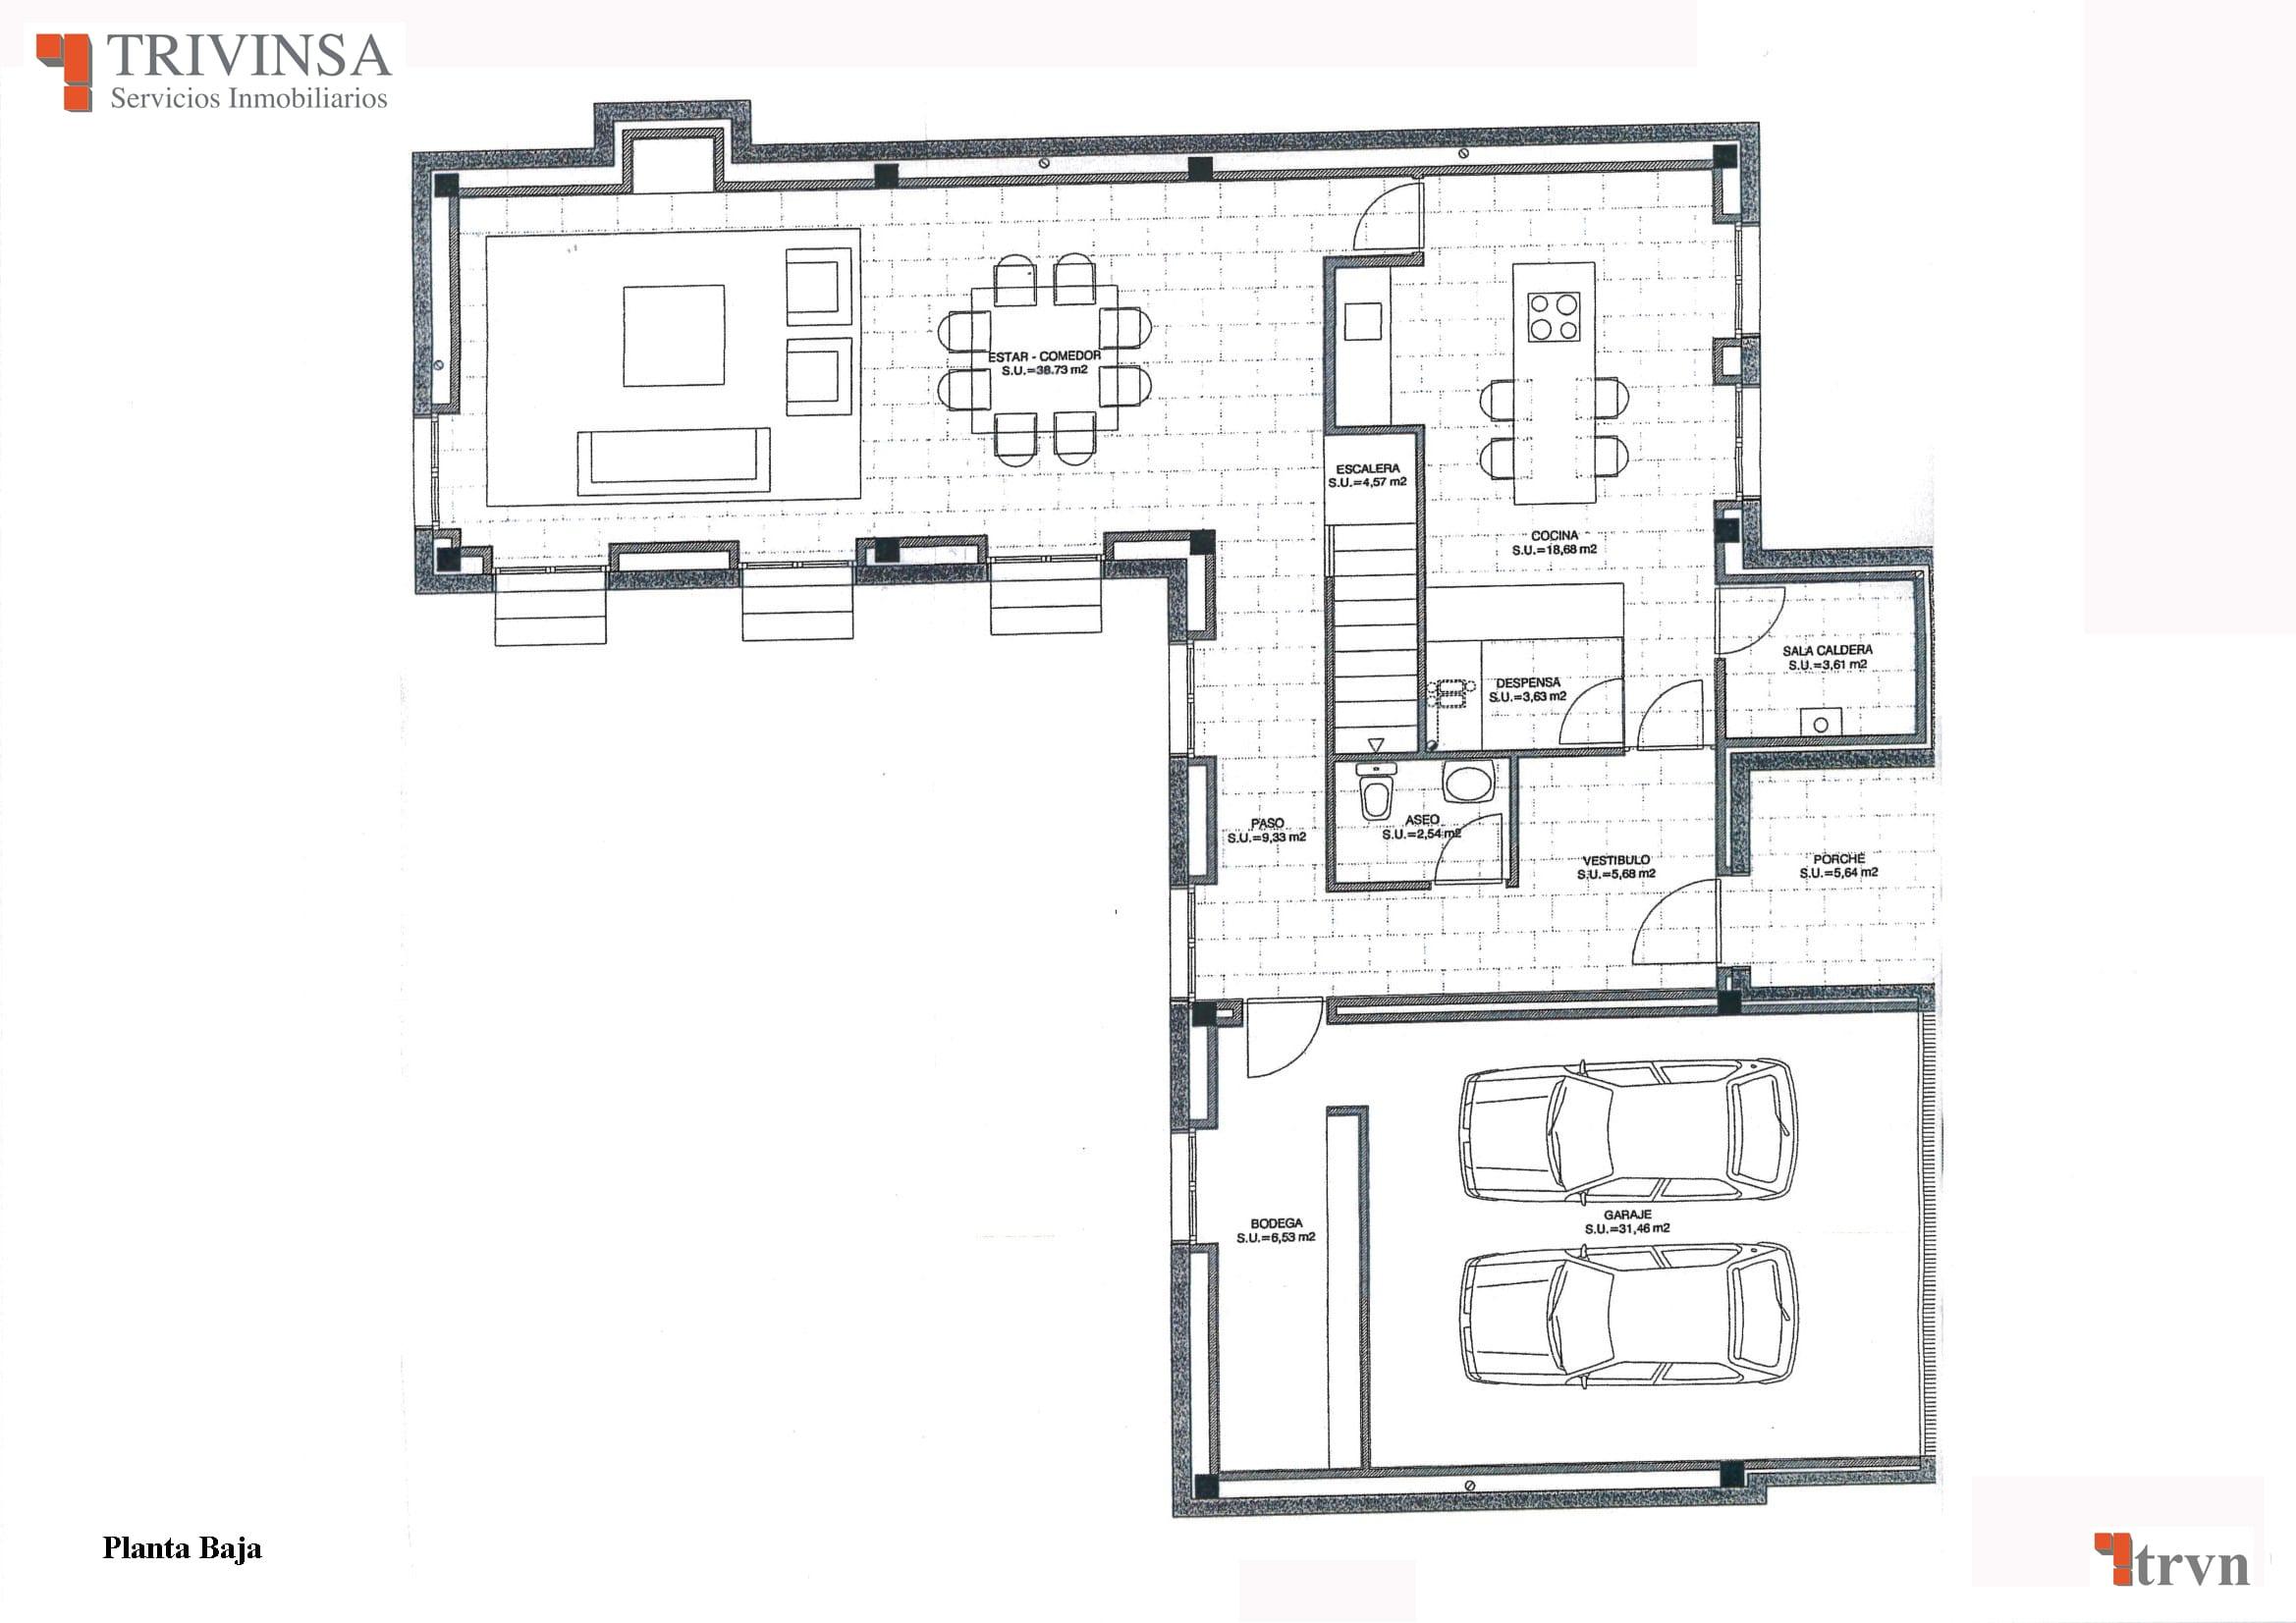 C03533-COTAS PLANTA BAJA